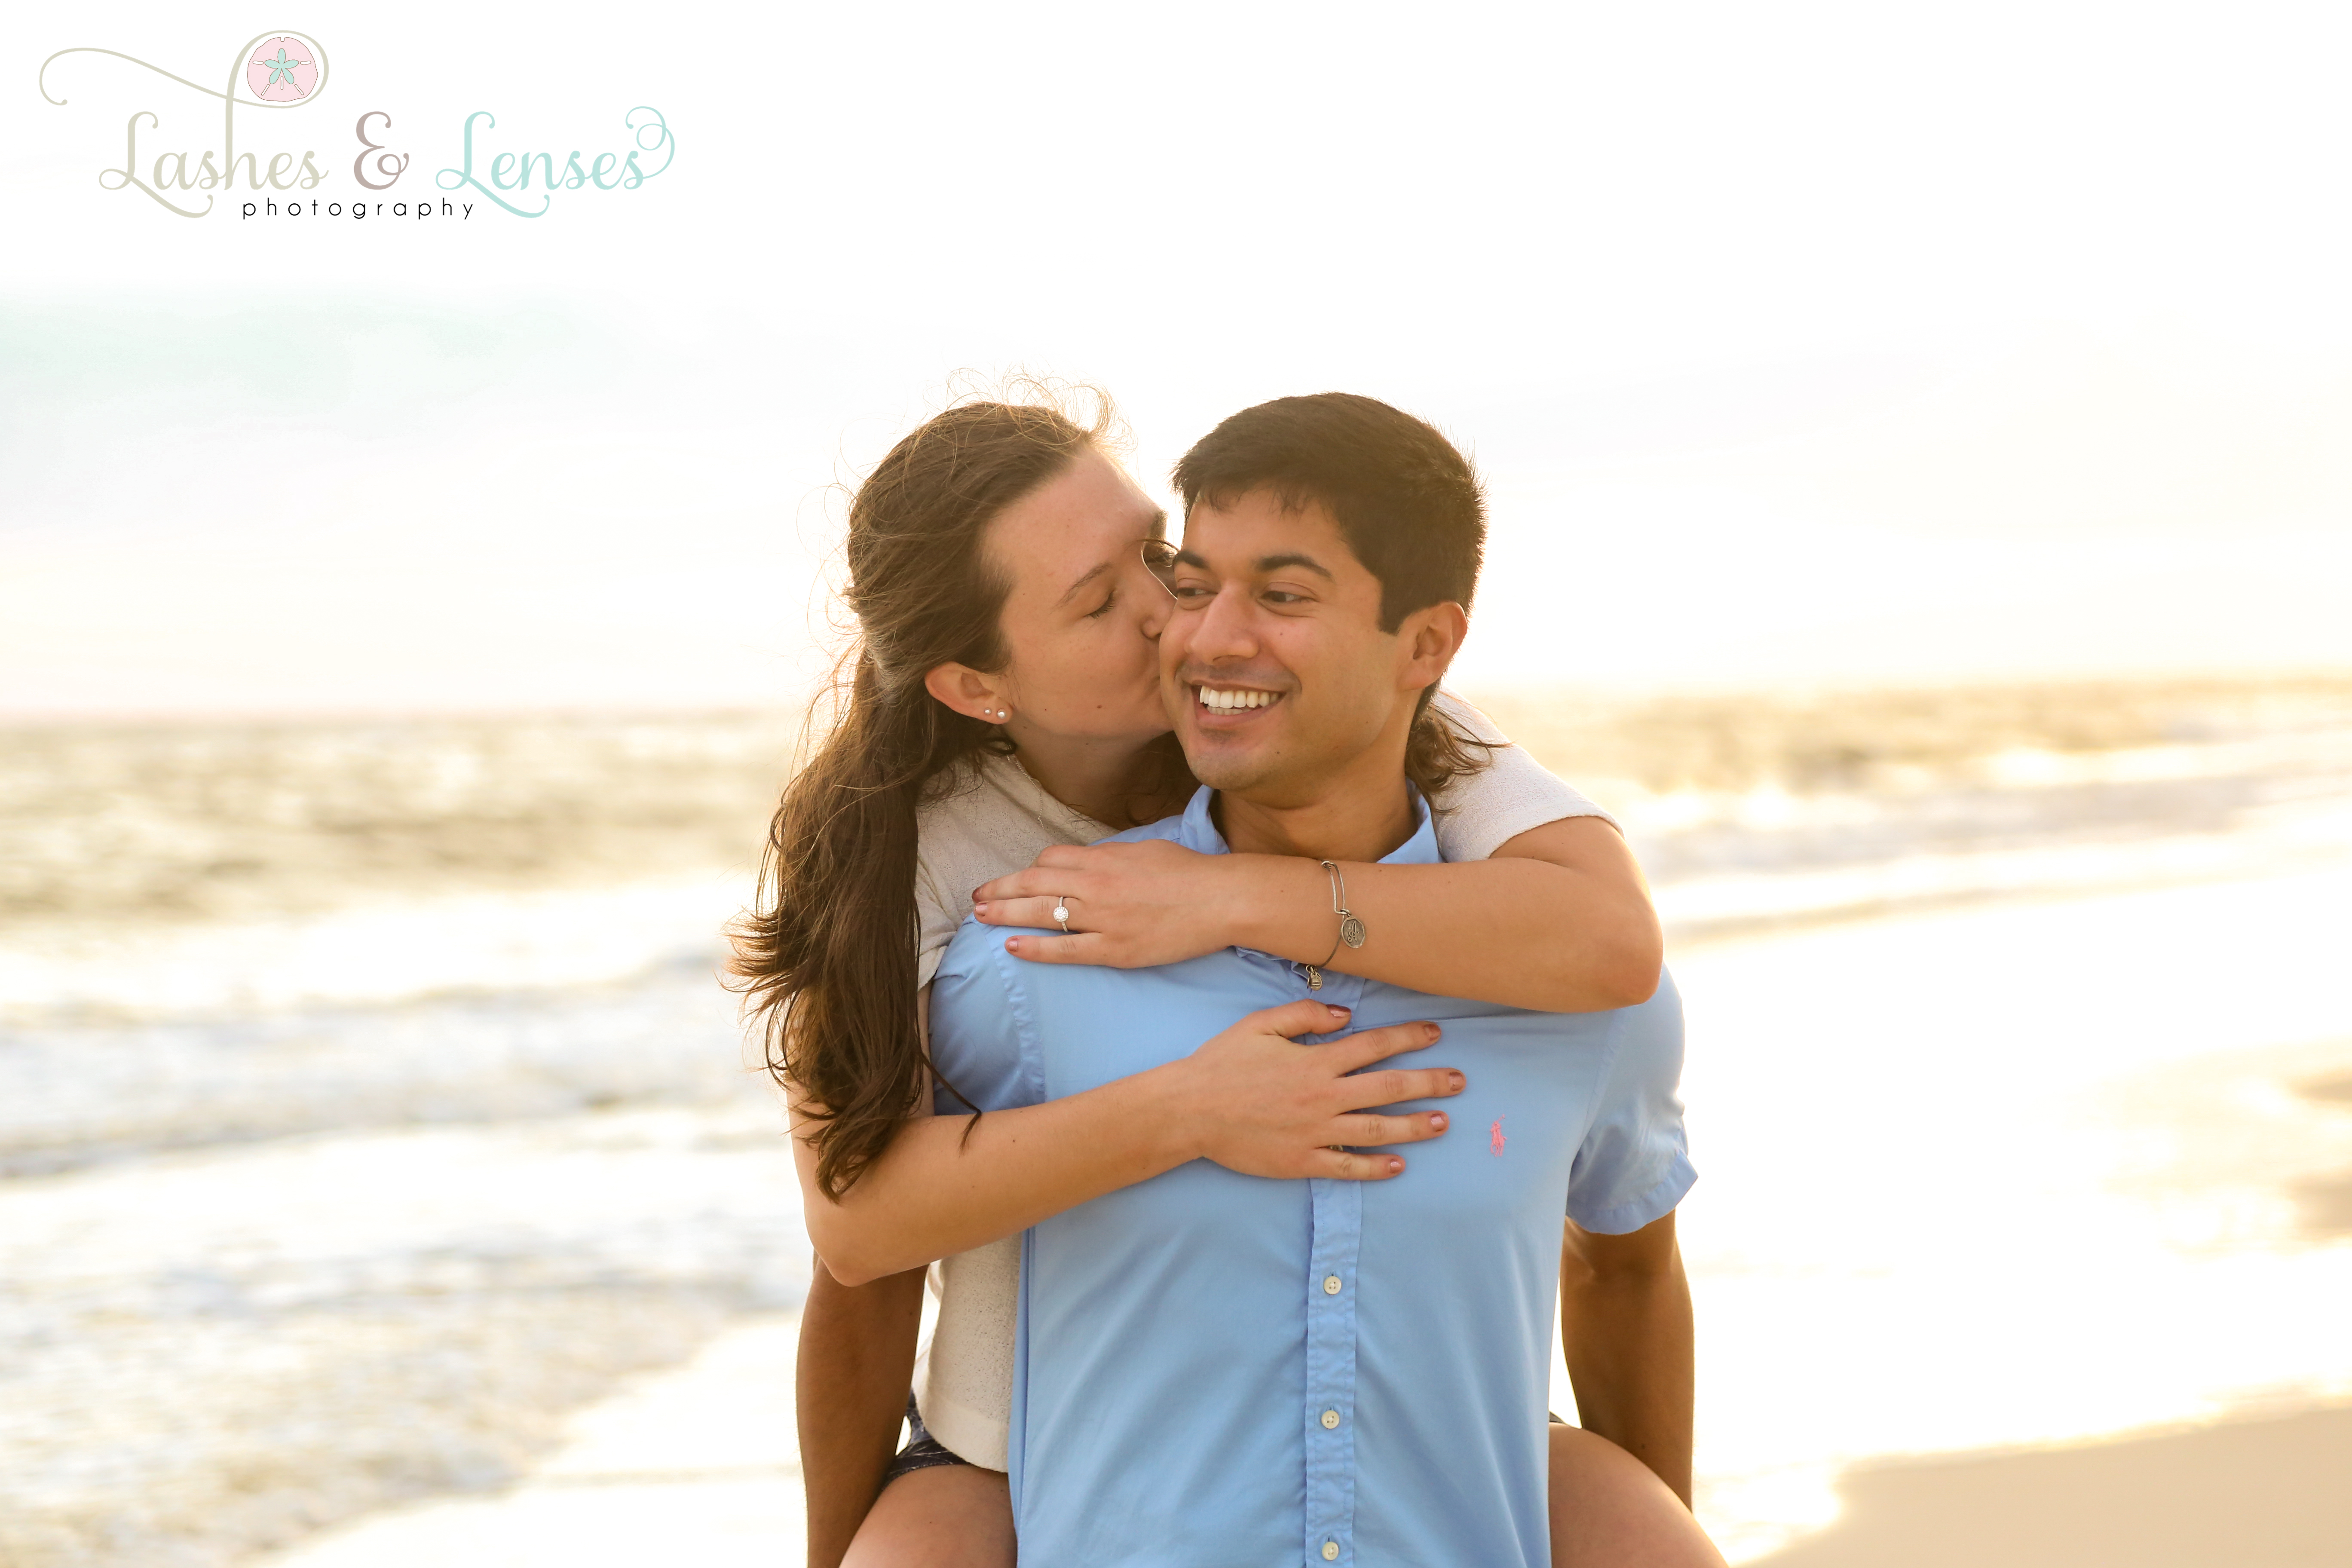 Fiancee kissing her new fiancé's cheek on the beach at Johnson's Beach in Perdido Key